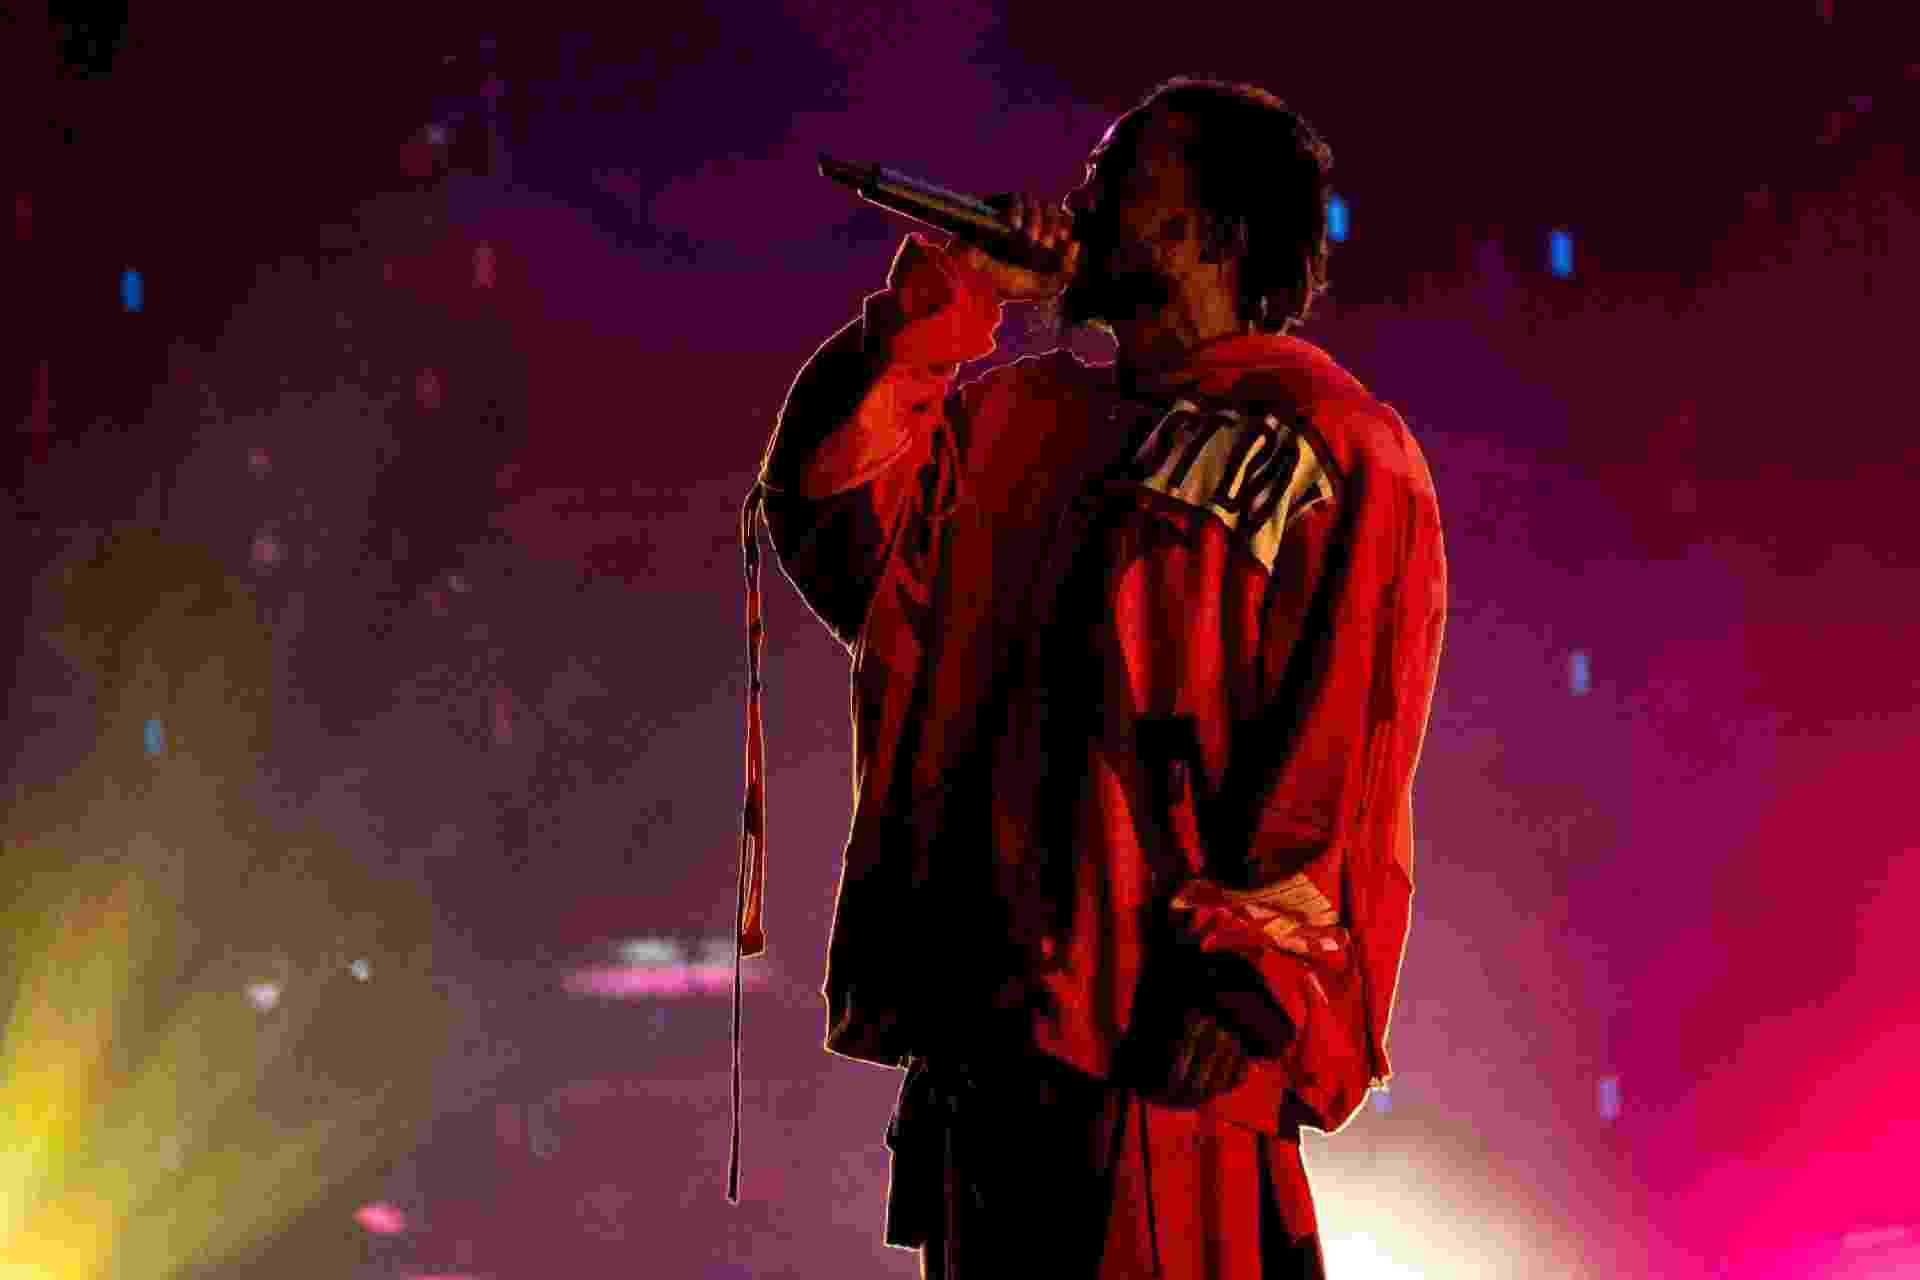 Kendrick Lamar se apresenta no Lollapalooza Brasil 2019, em São Paulo - Flávio Moraes/UOL